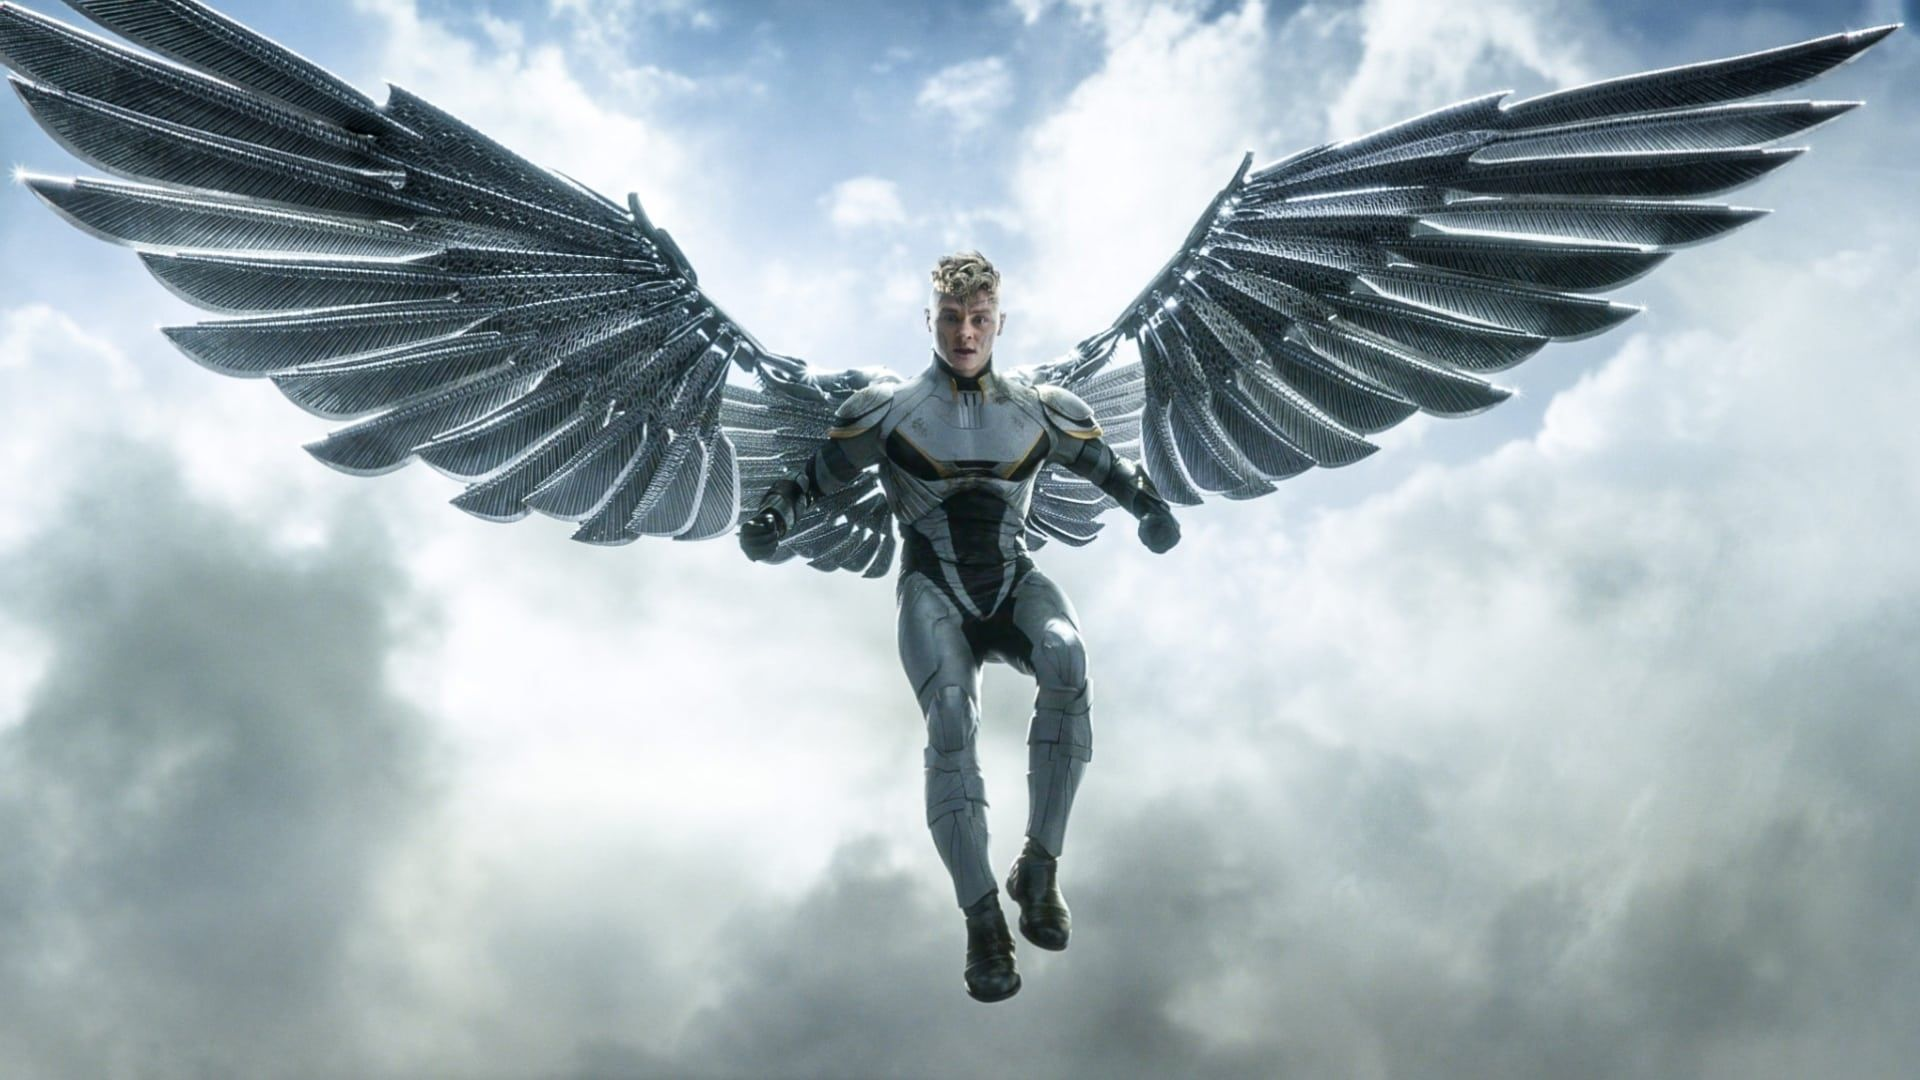 X Men Apokalipszis 2016 Online Teljes Film Filmek Magyarul Letoltes Hd Tiz Evvel Az Eljovendo Mult Napjai Rendkivuli Esemenye X Men Xmen Apocalypse Apocalypse